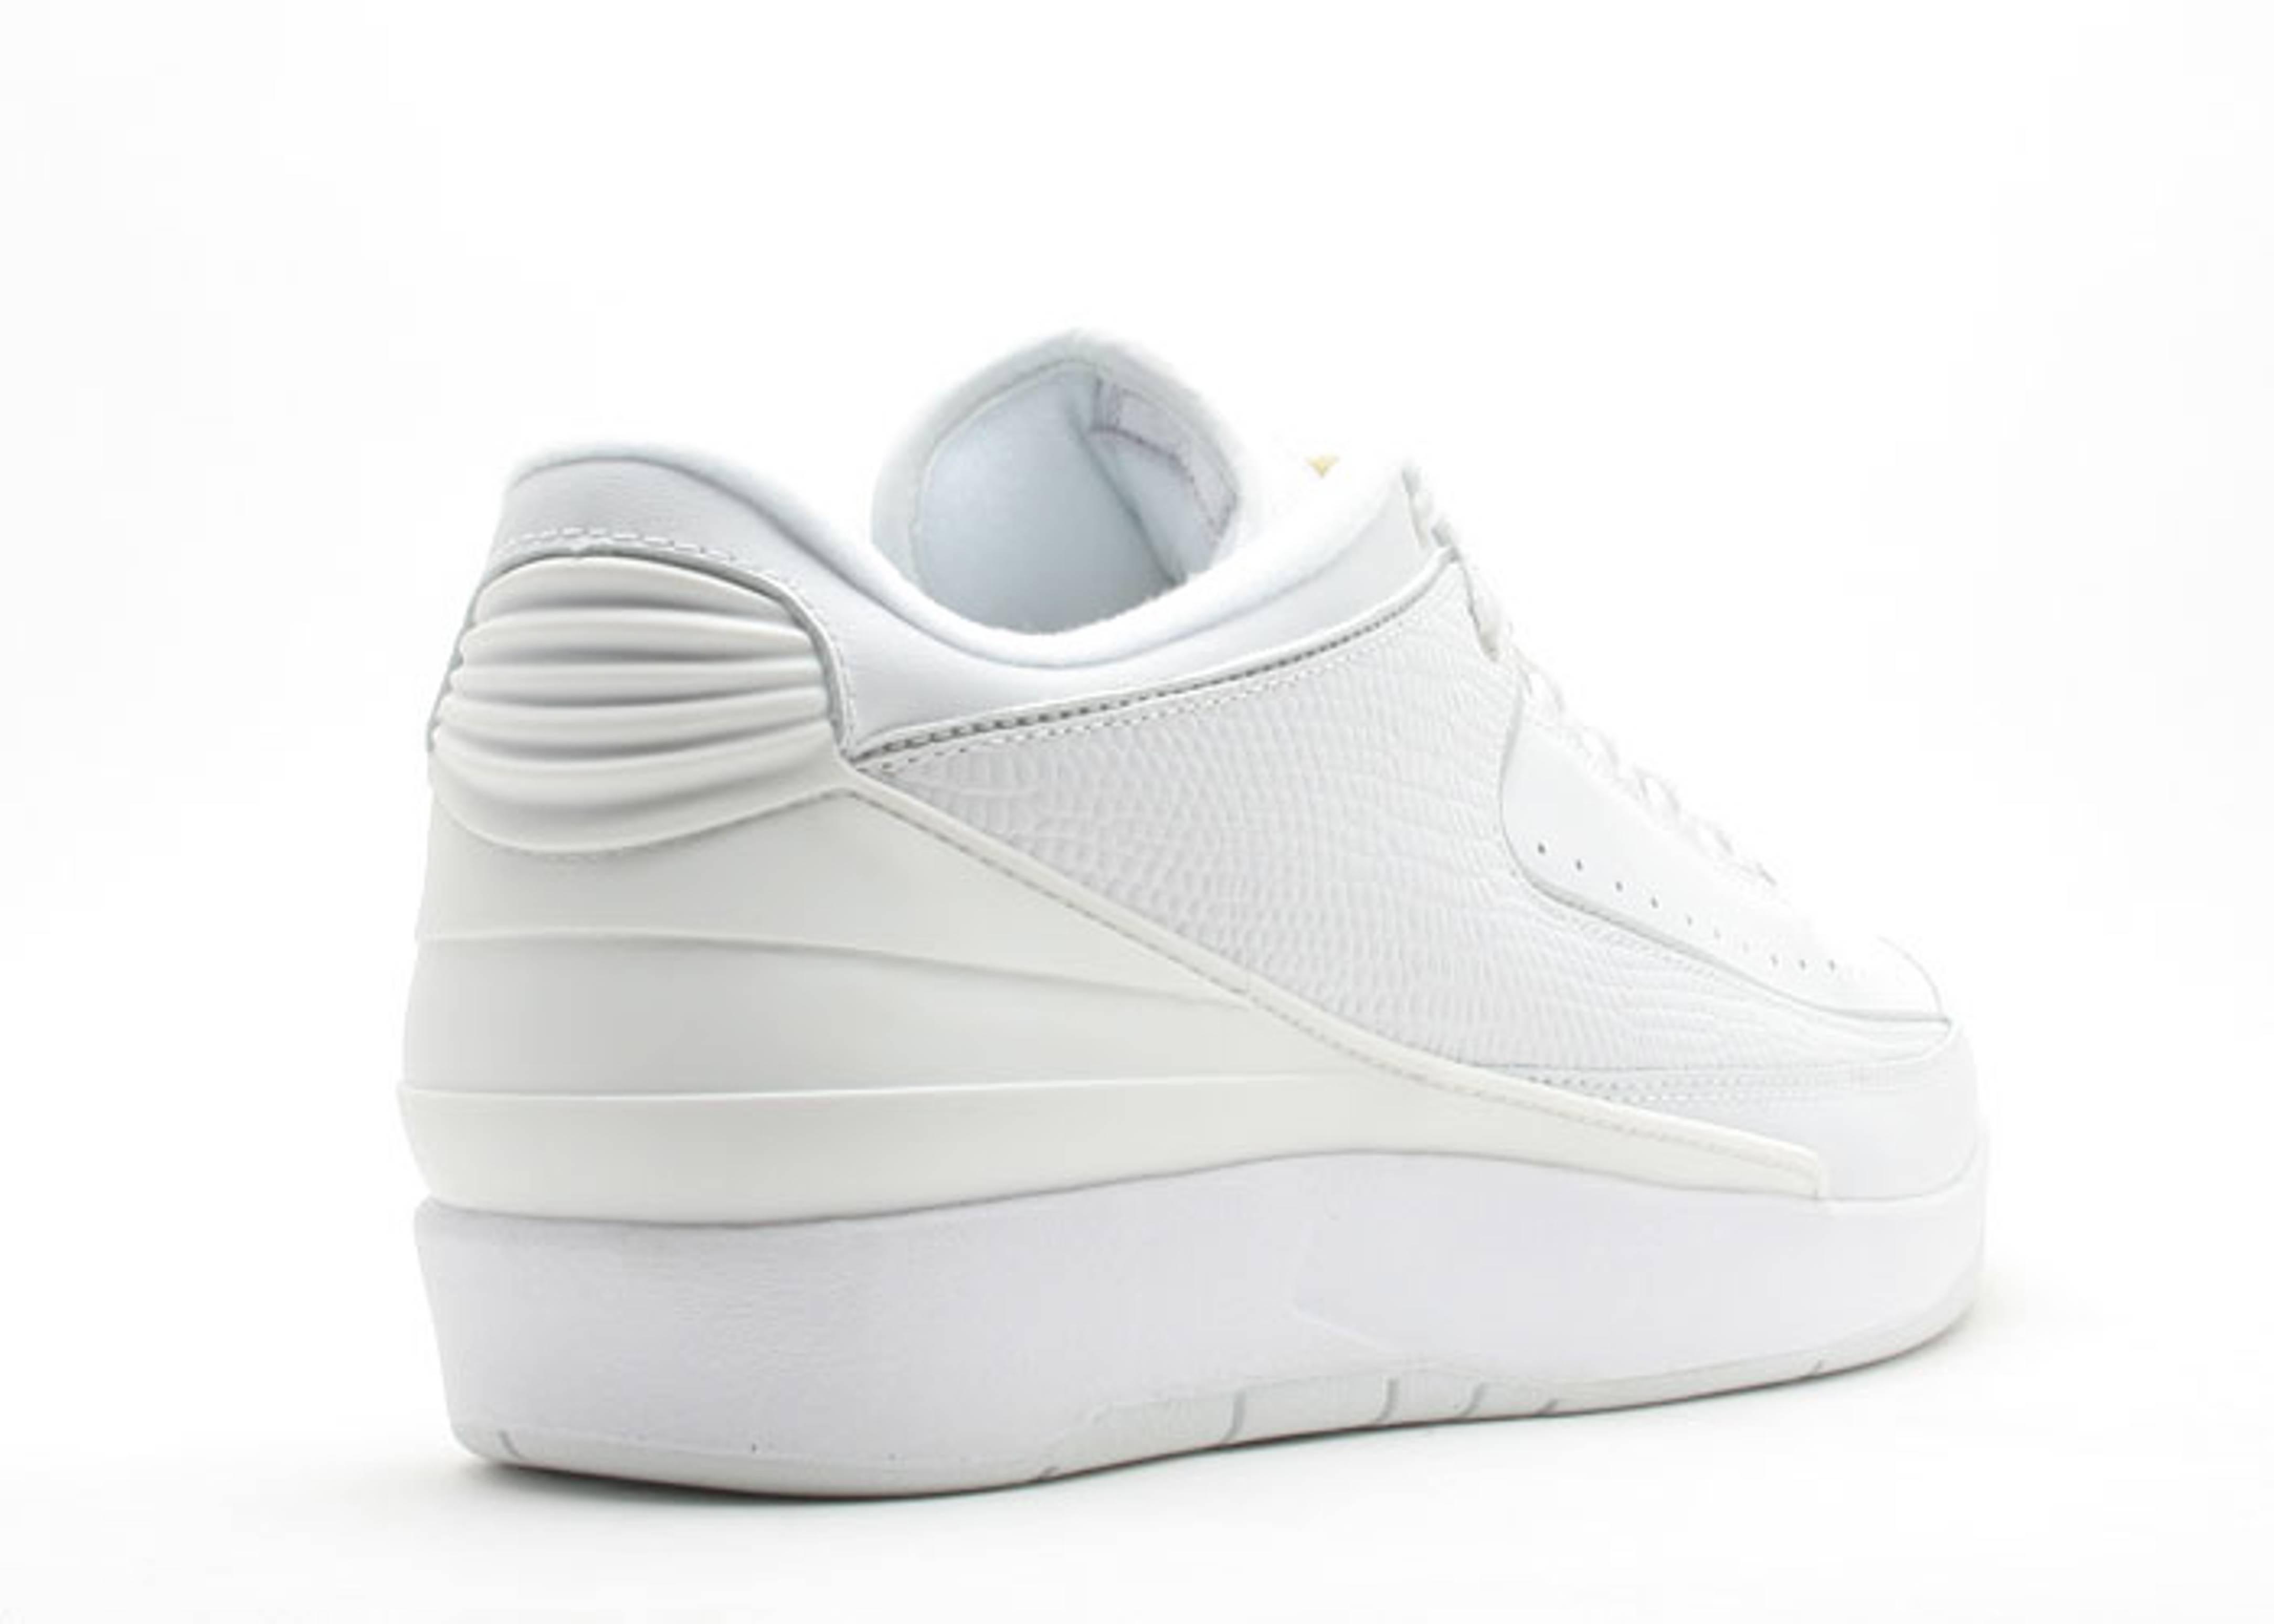 8e0b06e1ebb703 Air Jordan 2 Retro Low - Air Jordan - 309837 102 - white metallic silver-varsity  maize